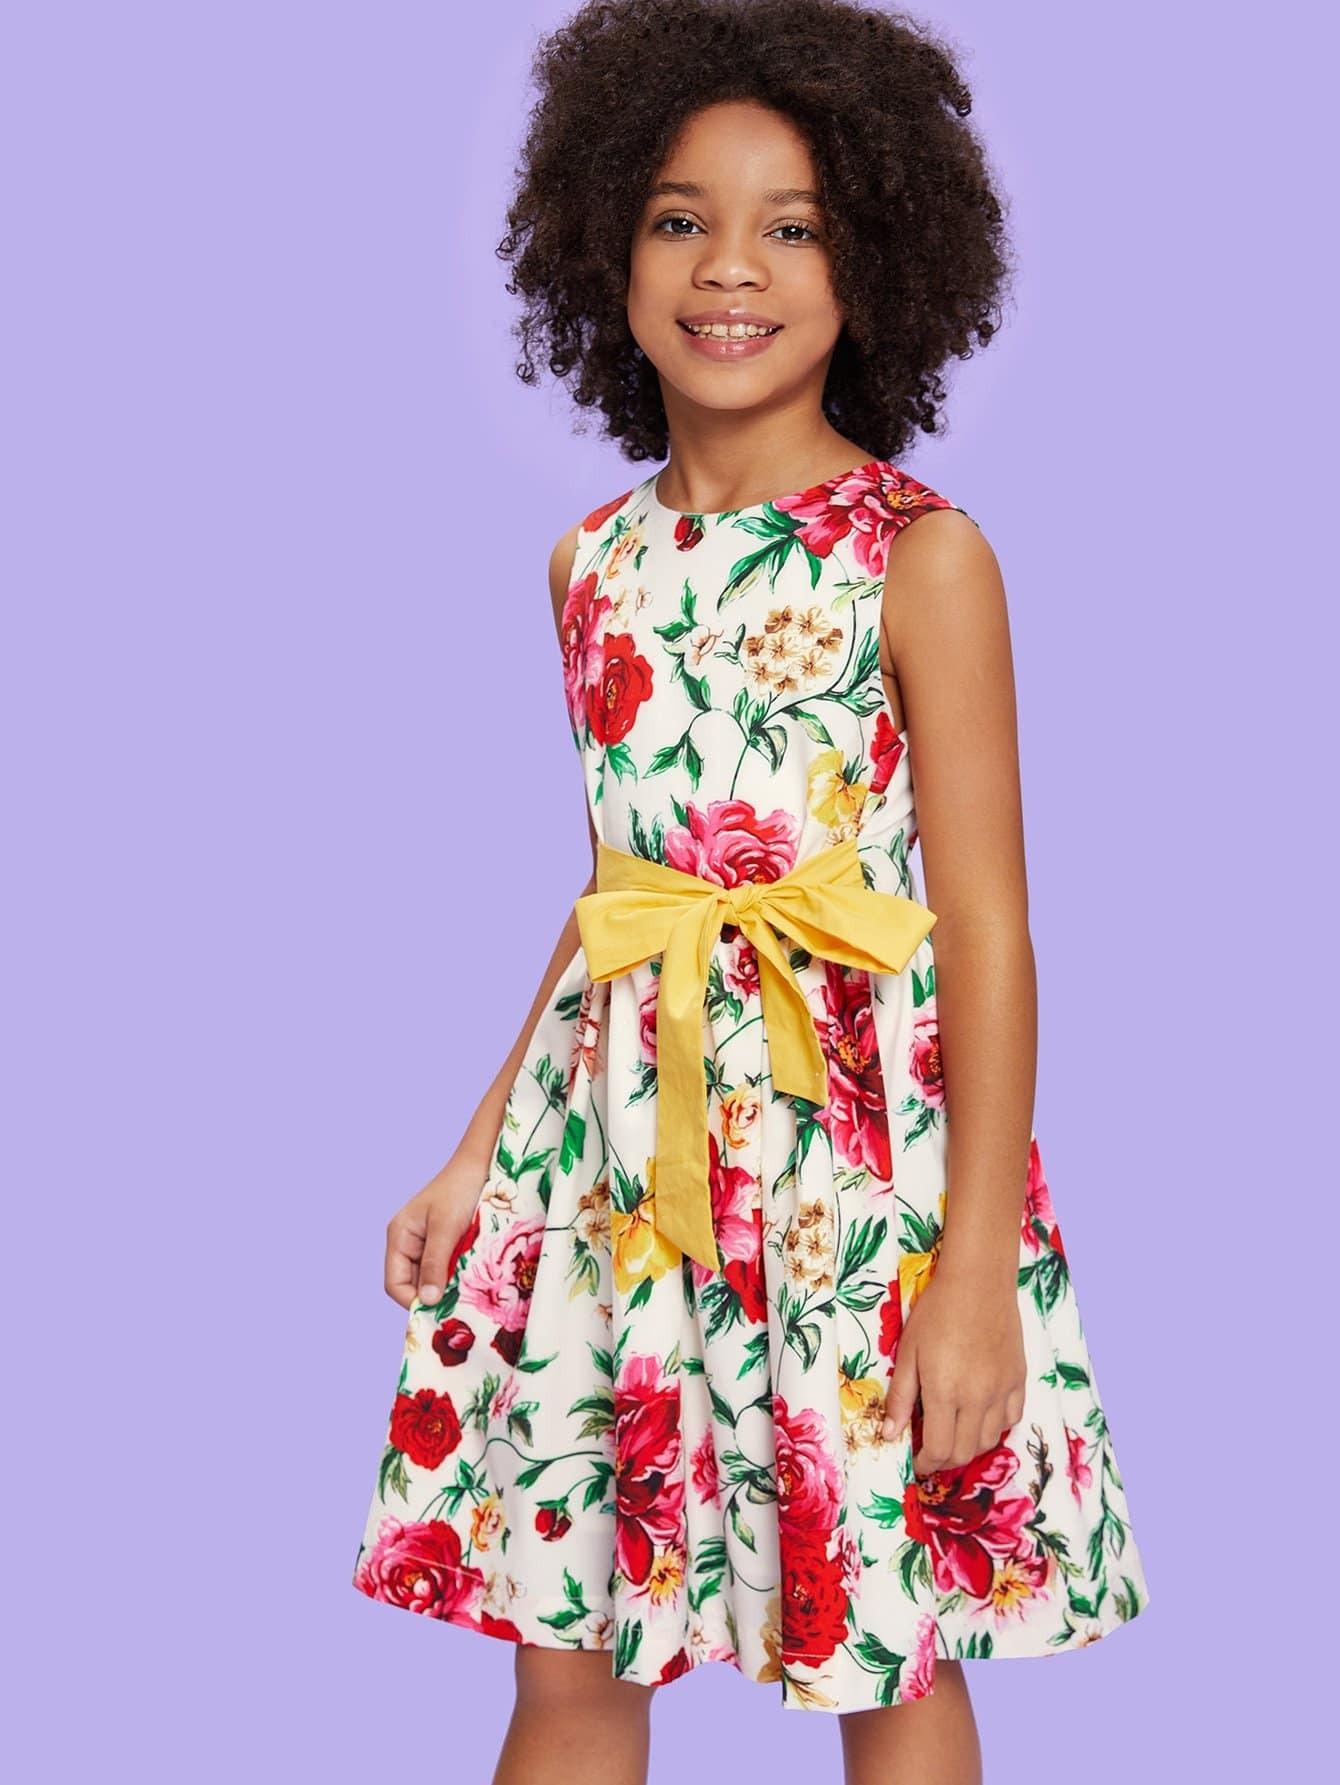 Girls Flower Print Sleeveless Dress dinstry dresses sleeveless kids dresses for girls wedding princess party pageant formal dress sleeveless flower girls dress 2018